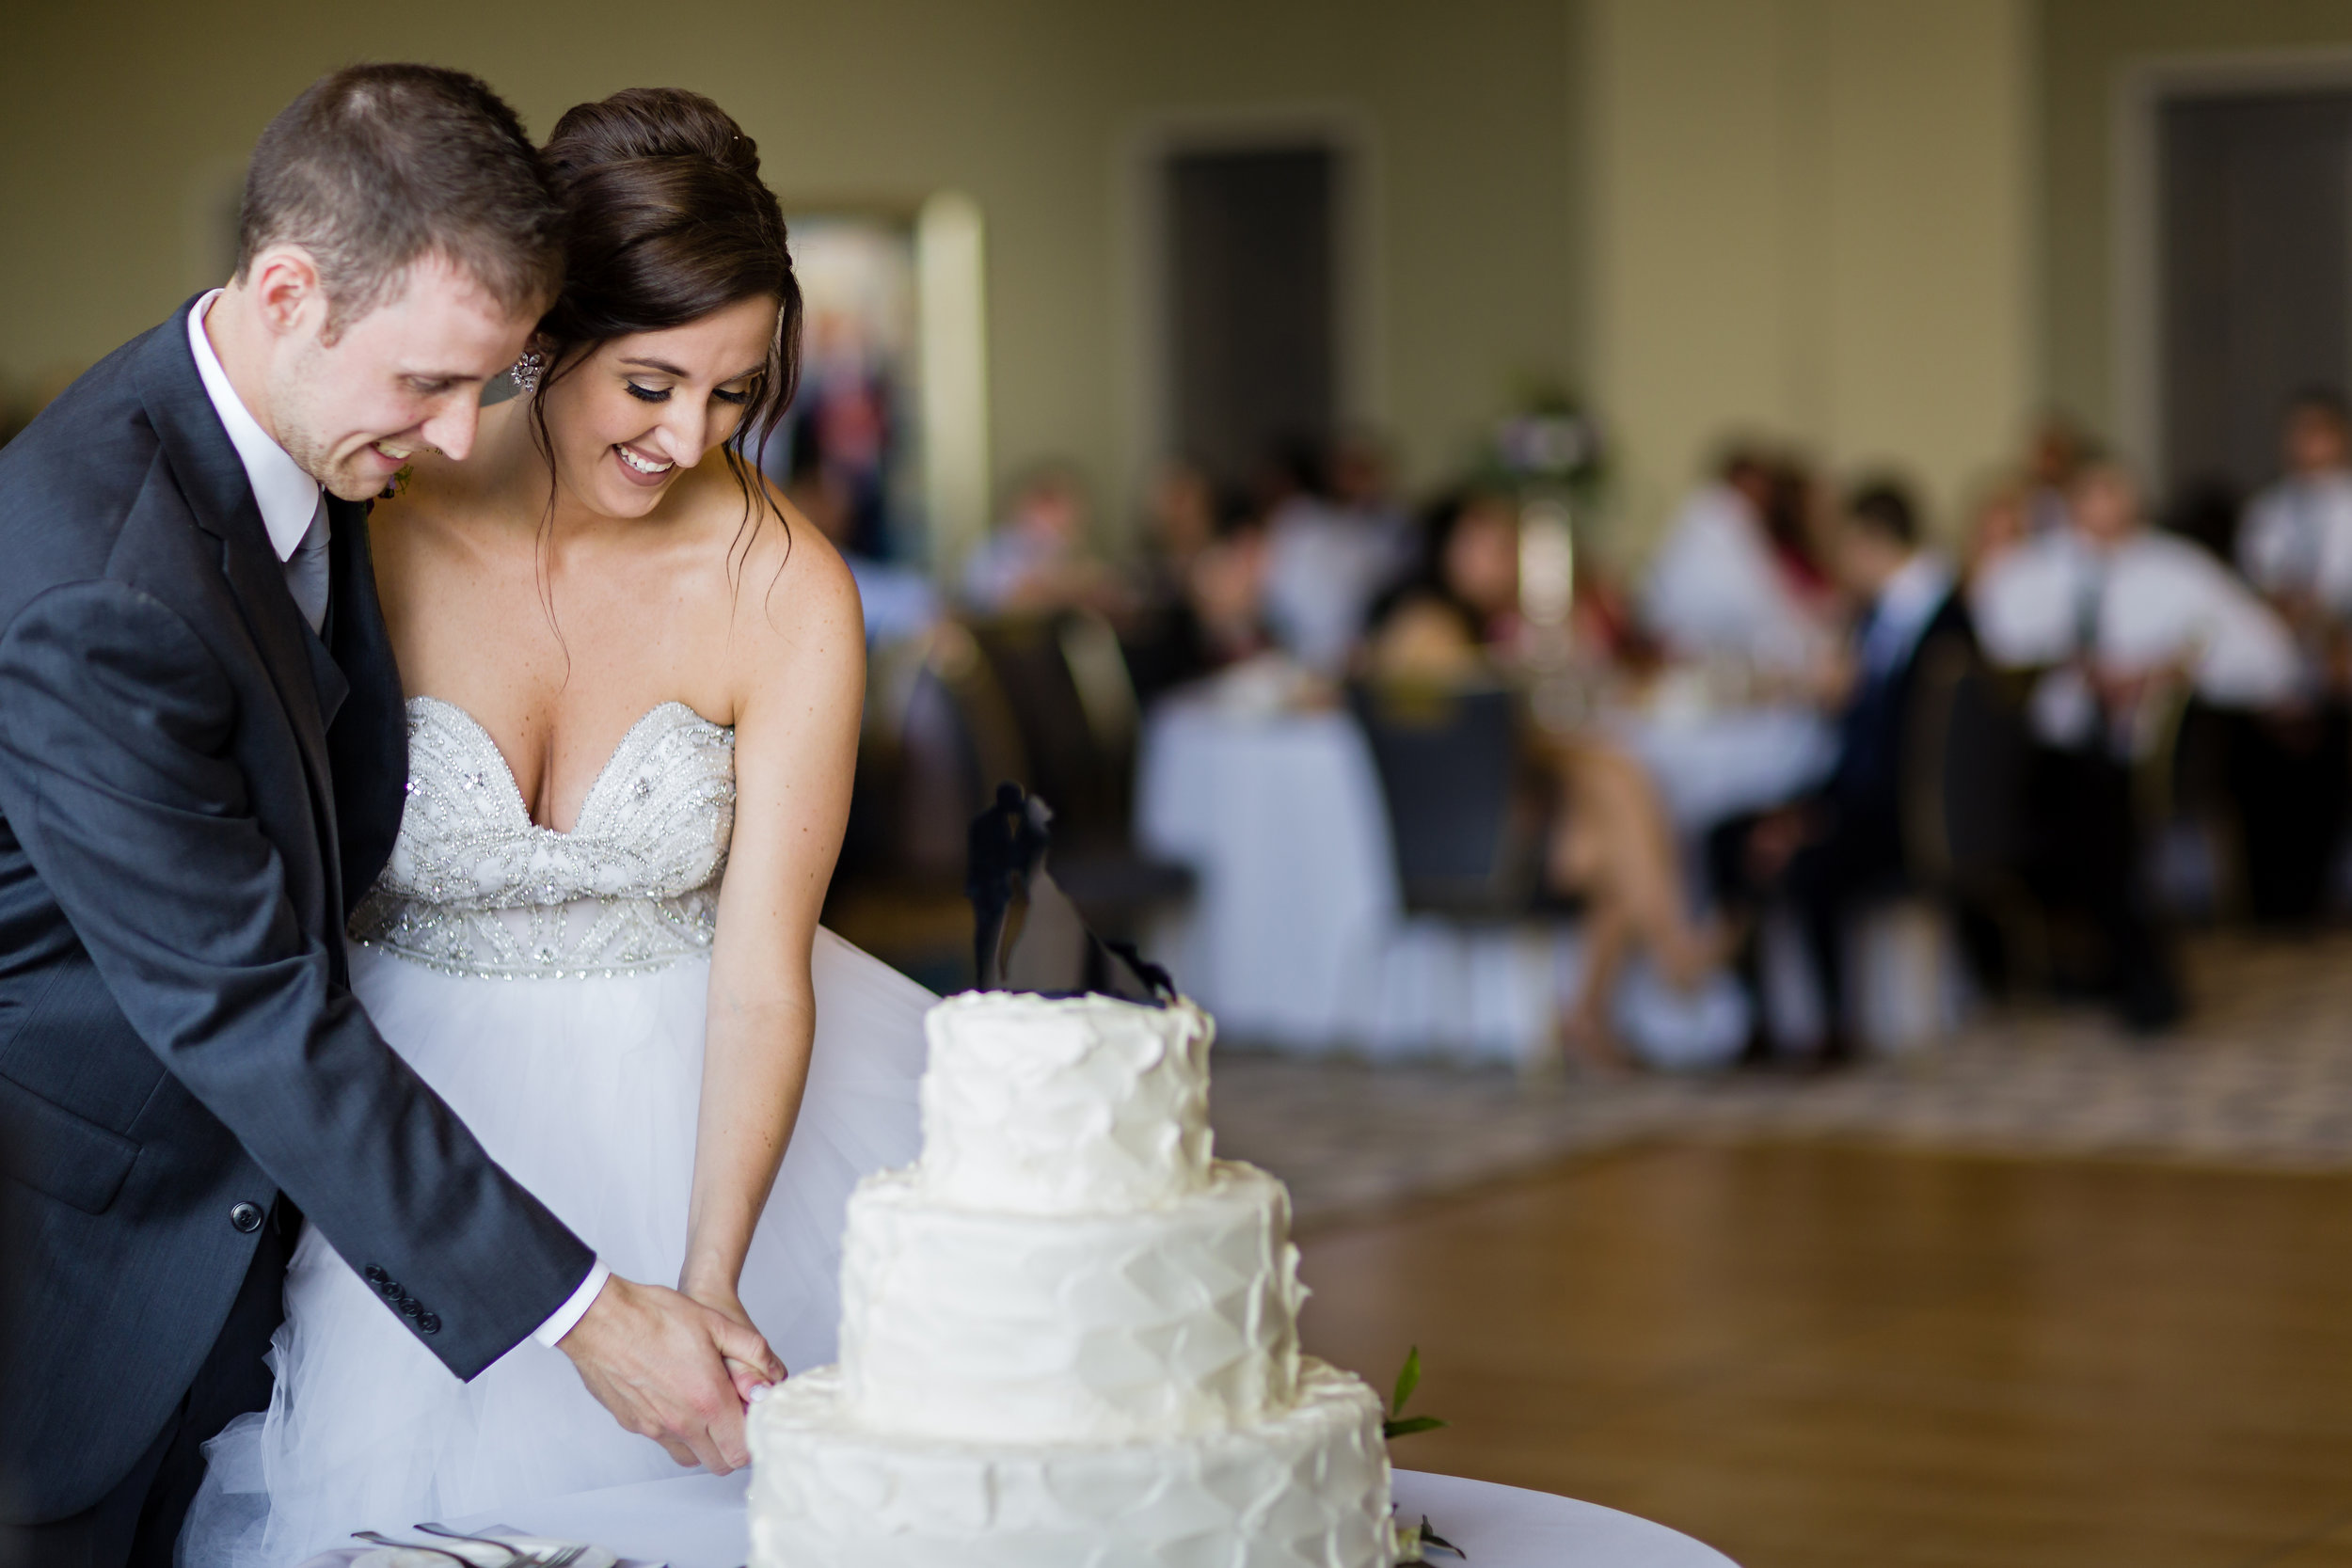 All White Wedding Cake - Pittsburgh Wedding Venue - Duquesne University Wedding